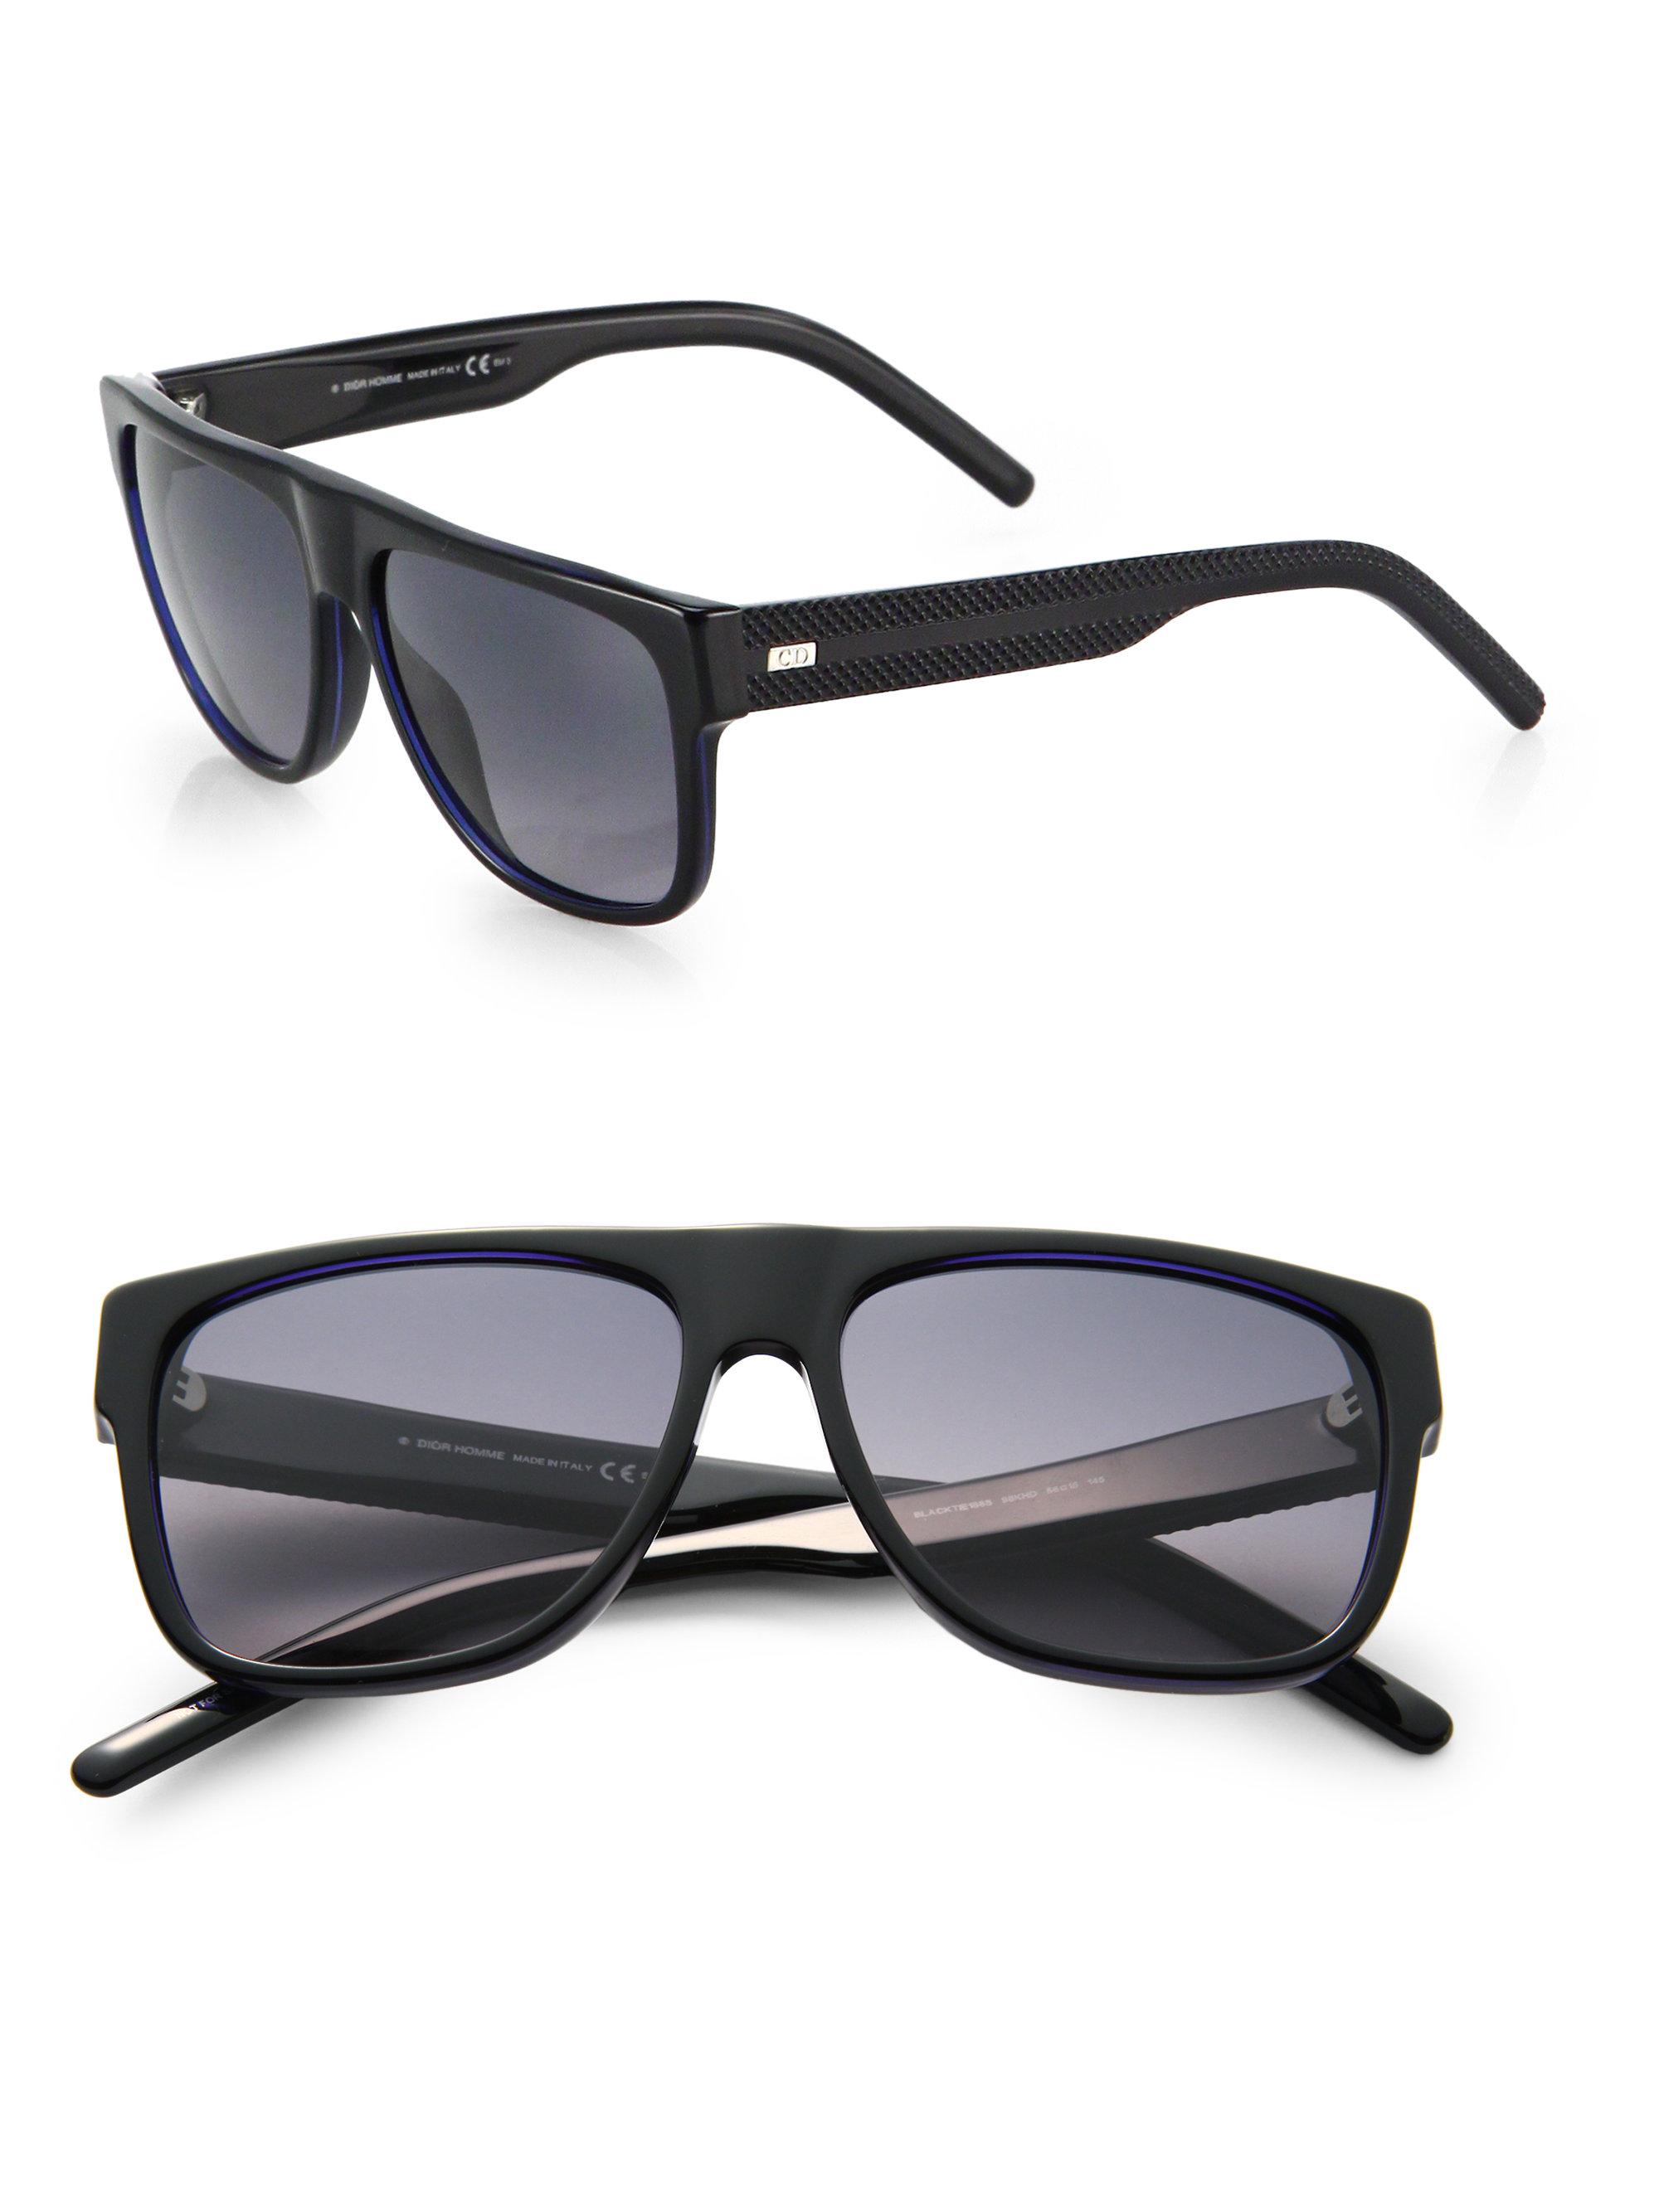 dior black tie sunglasses photo - 1